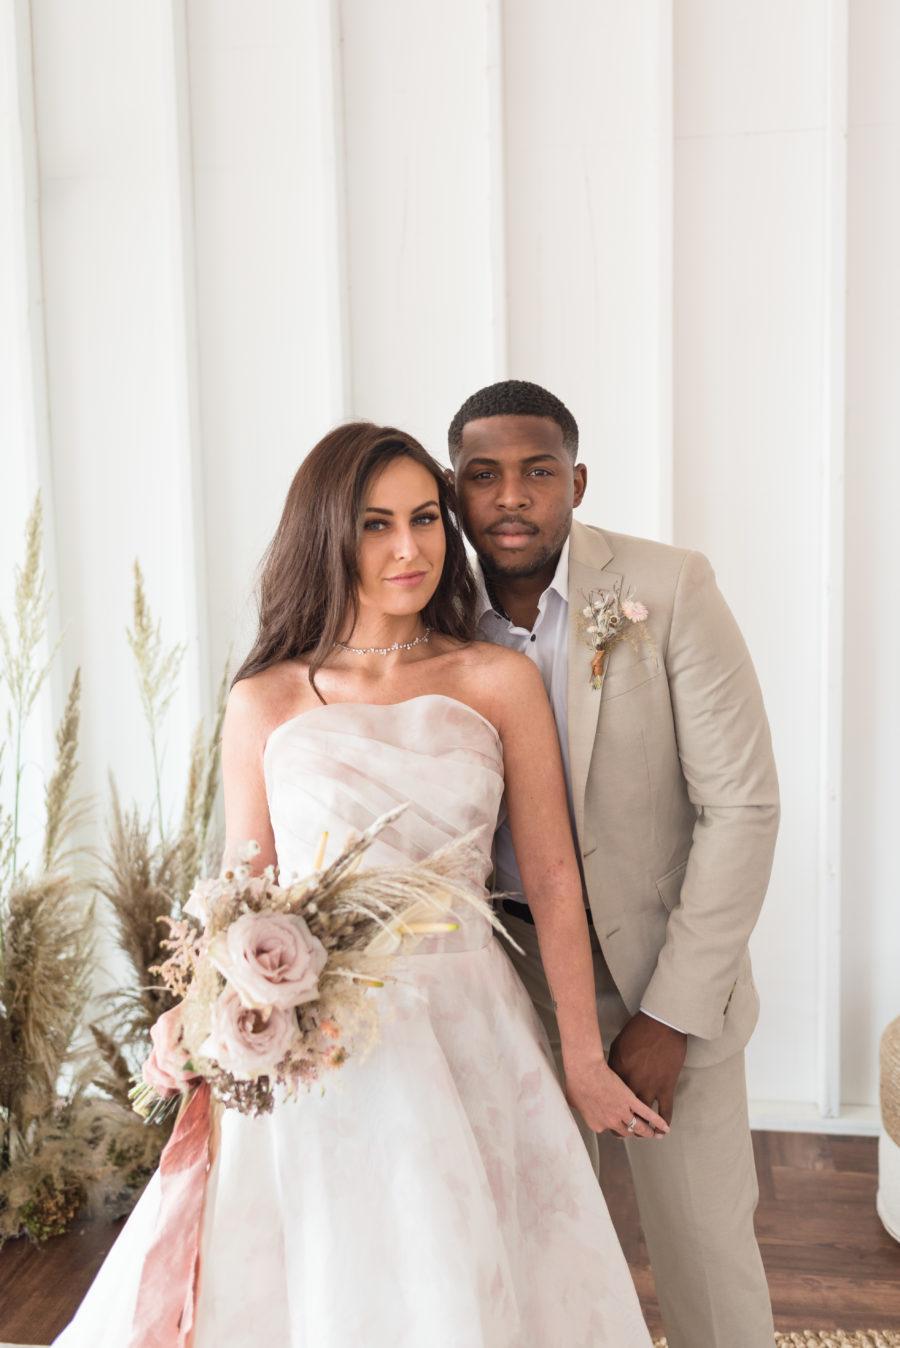 Organic Blush Wedding Inspiration captured by Mandy Liz Photography